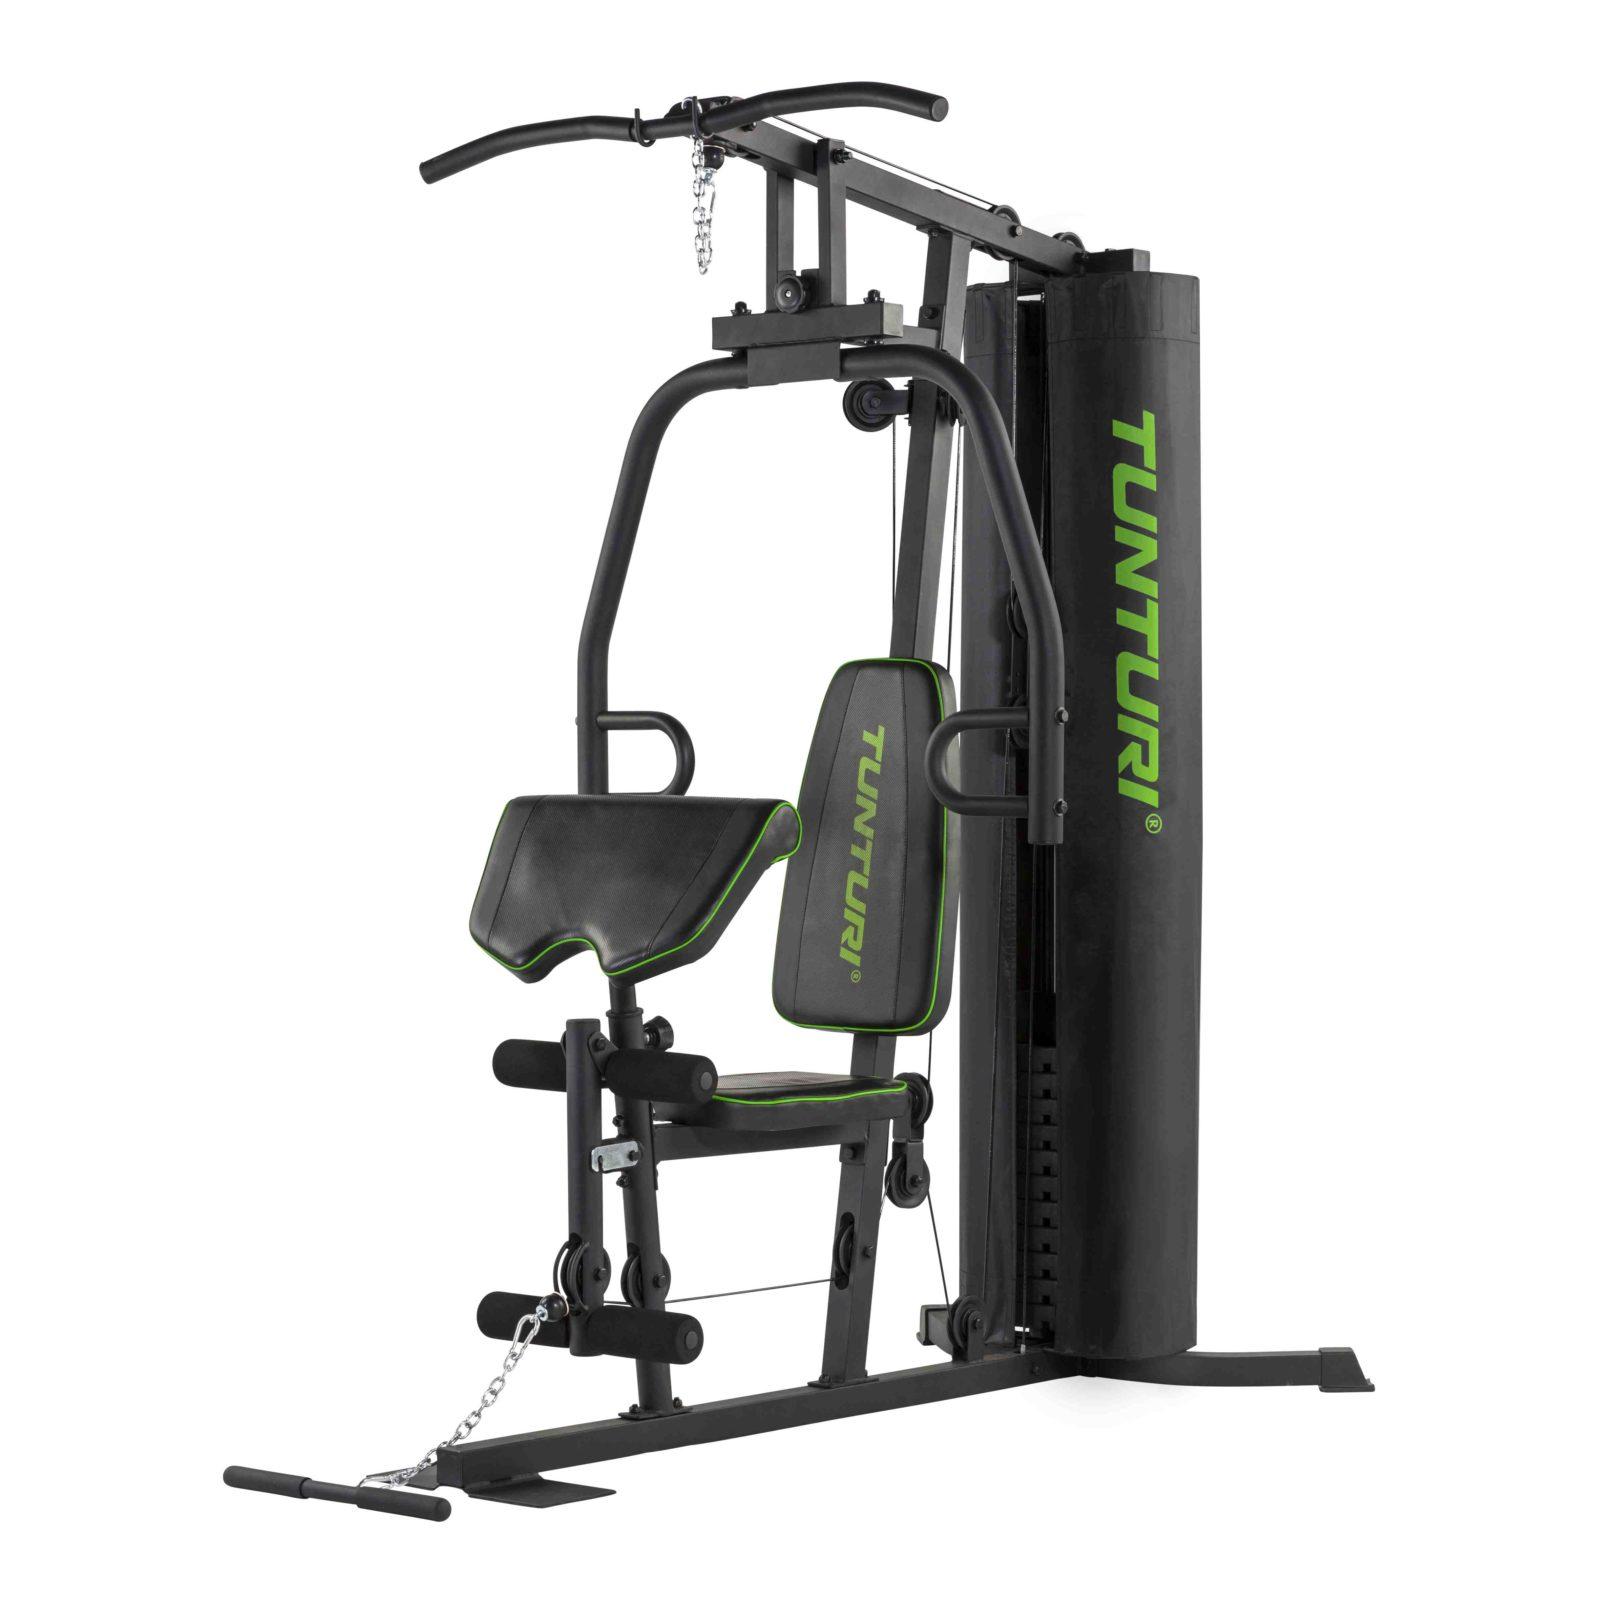 Weider  X Home Gym System